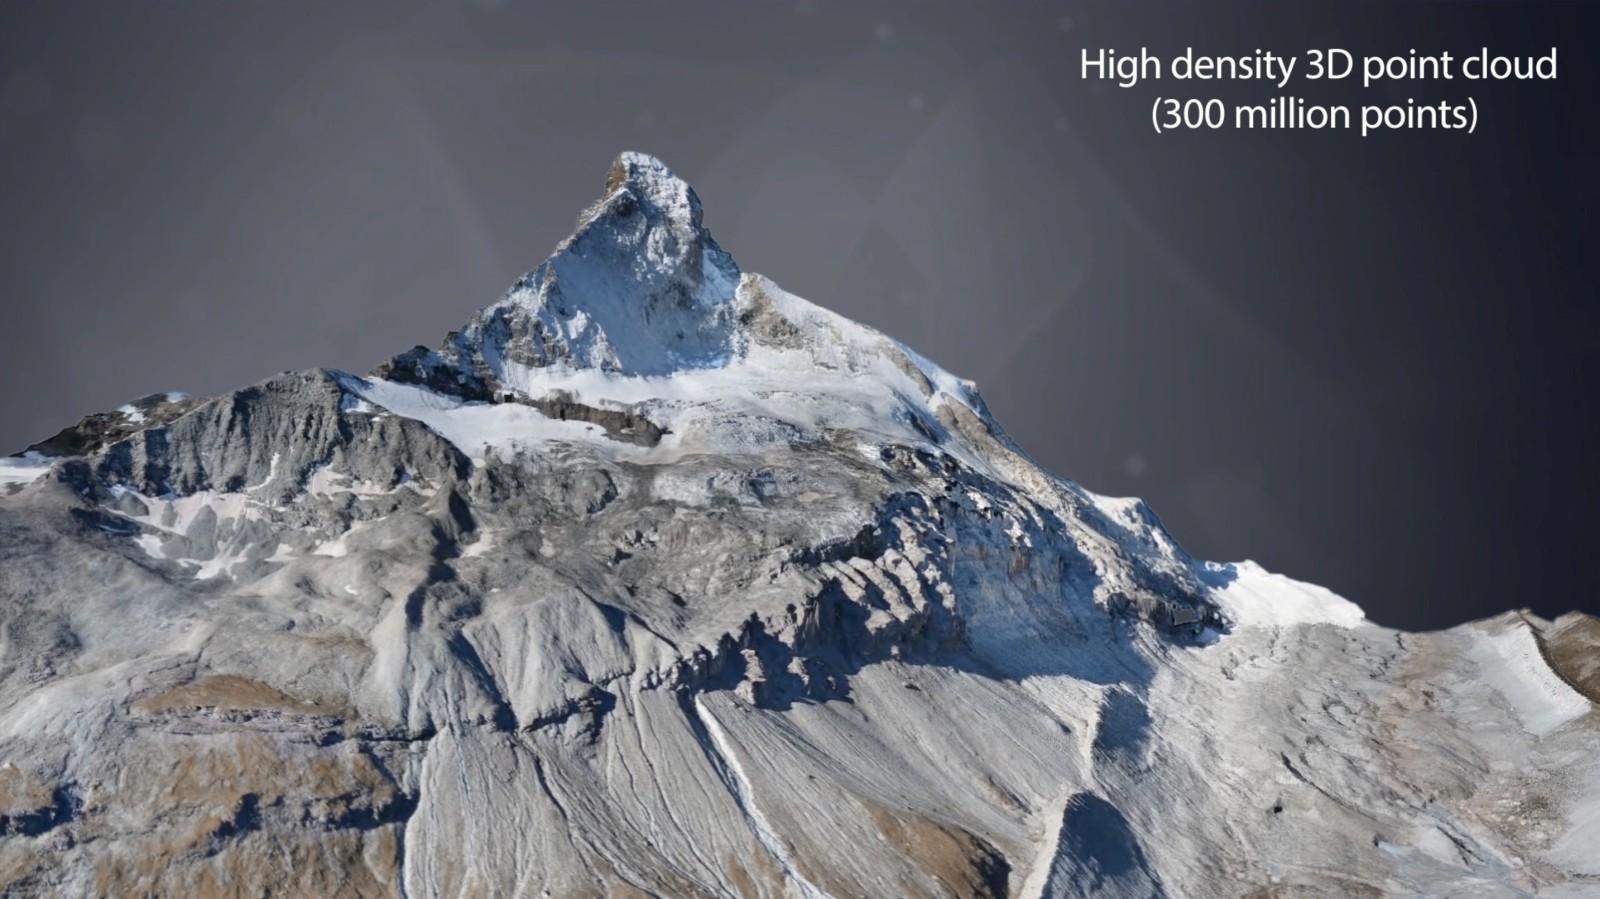 High density 3D point cloud